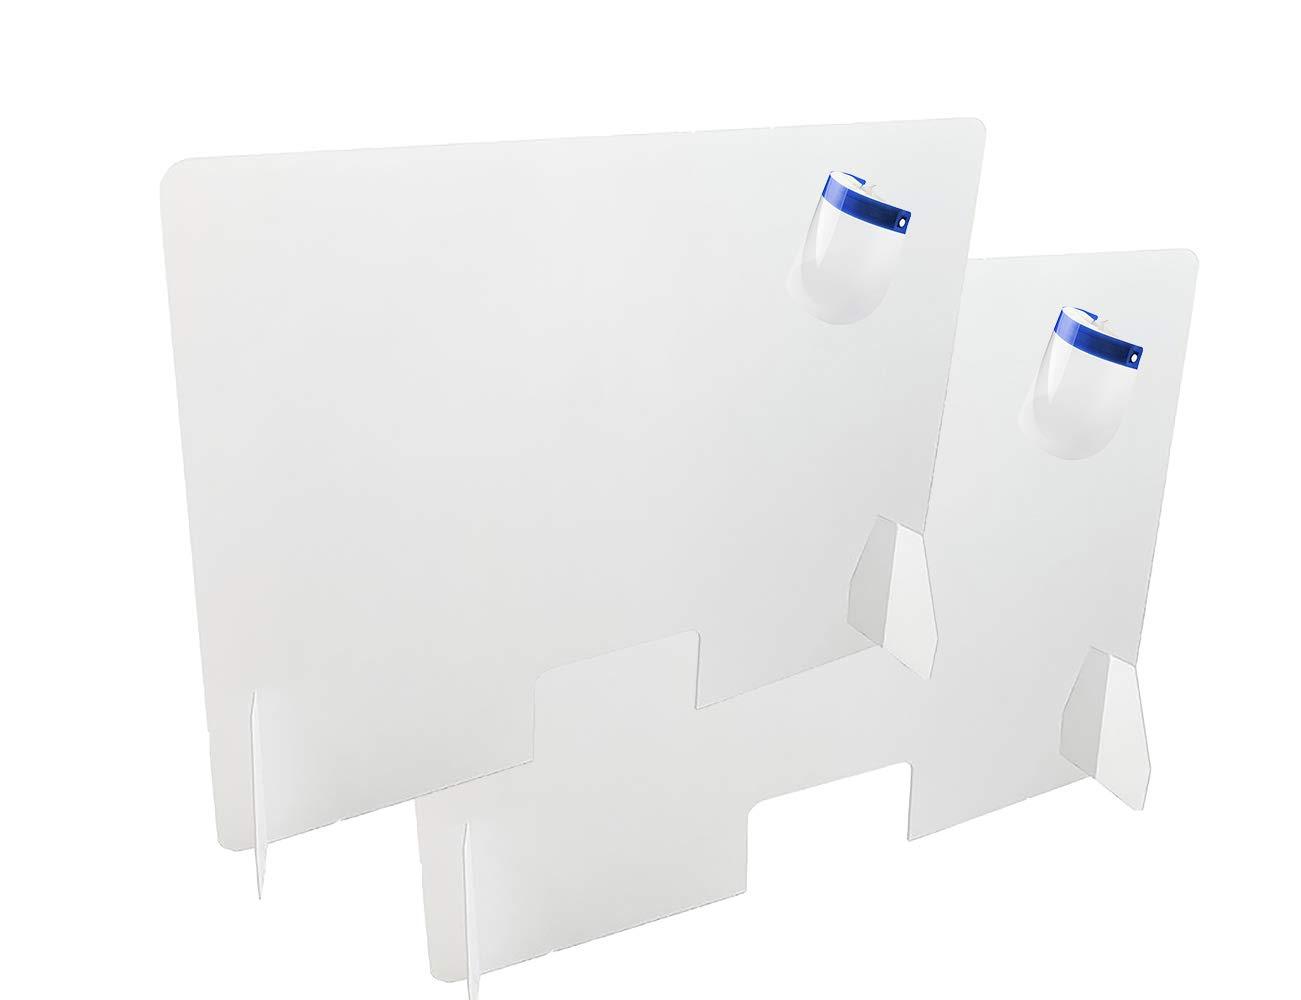 Dos Mamparas Protectoras para Mostrador | Tamaño 120 cm de ancho X 80 cms de alto, 4 mm de grosor, ventana de 15 x 26 cm | Metacrilato | Protector mostrador | Color transparente